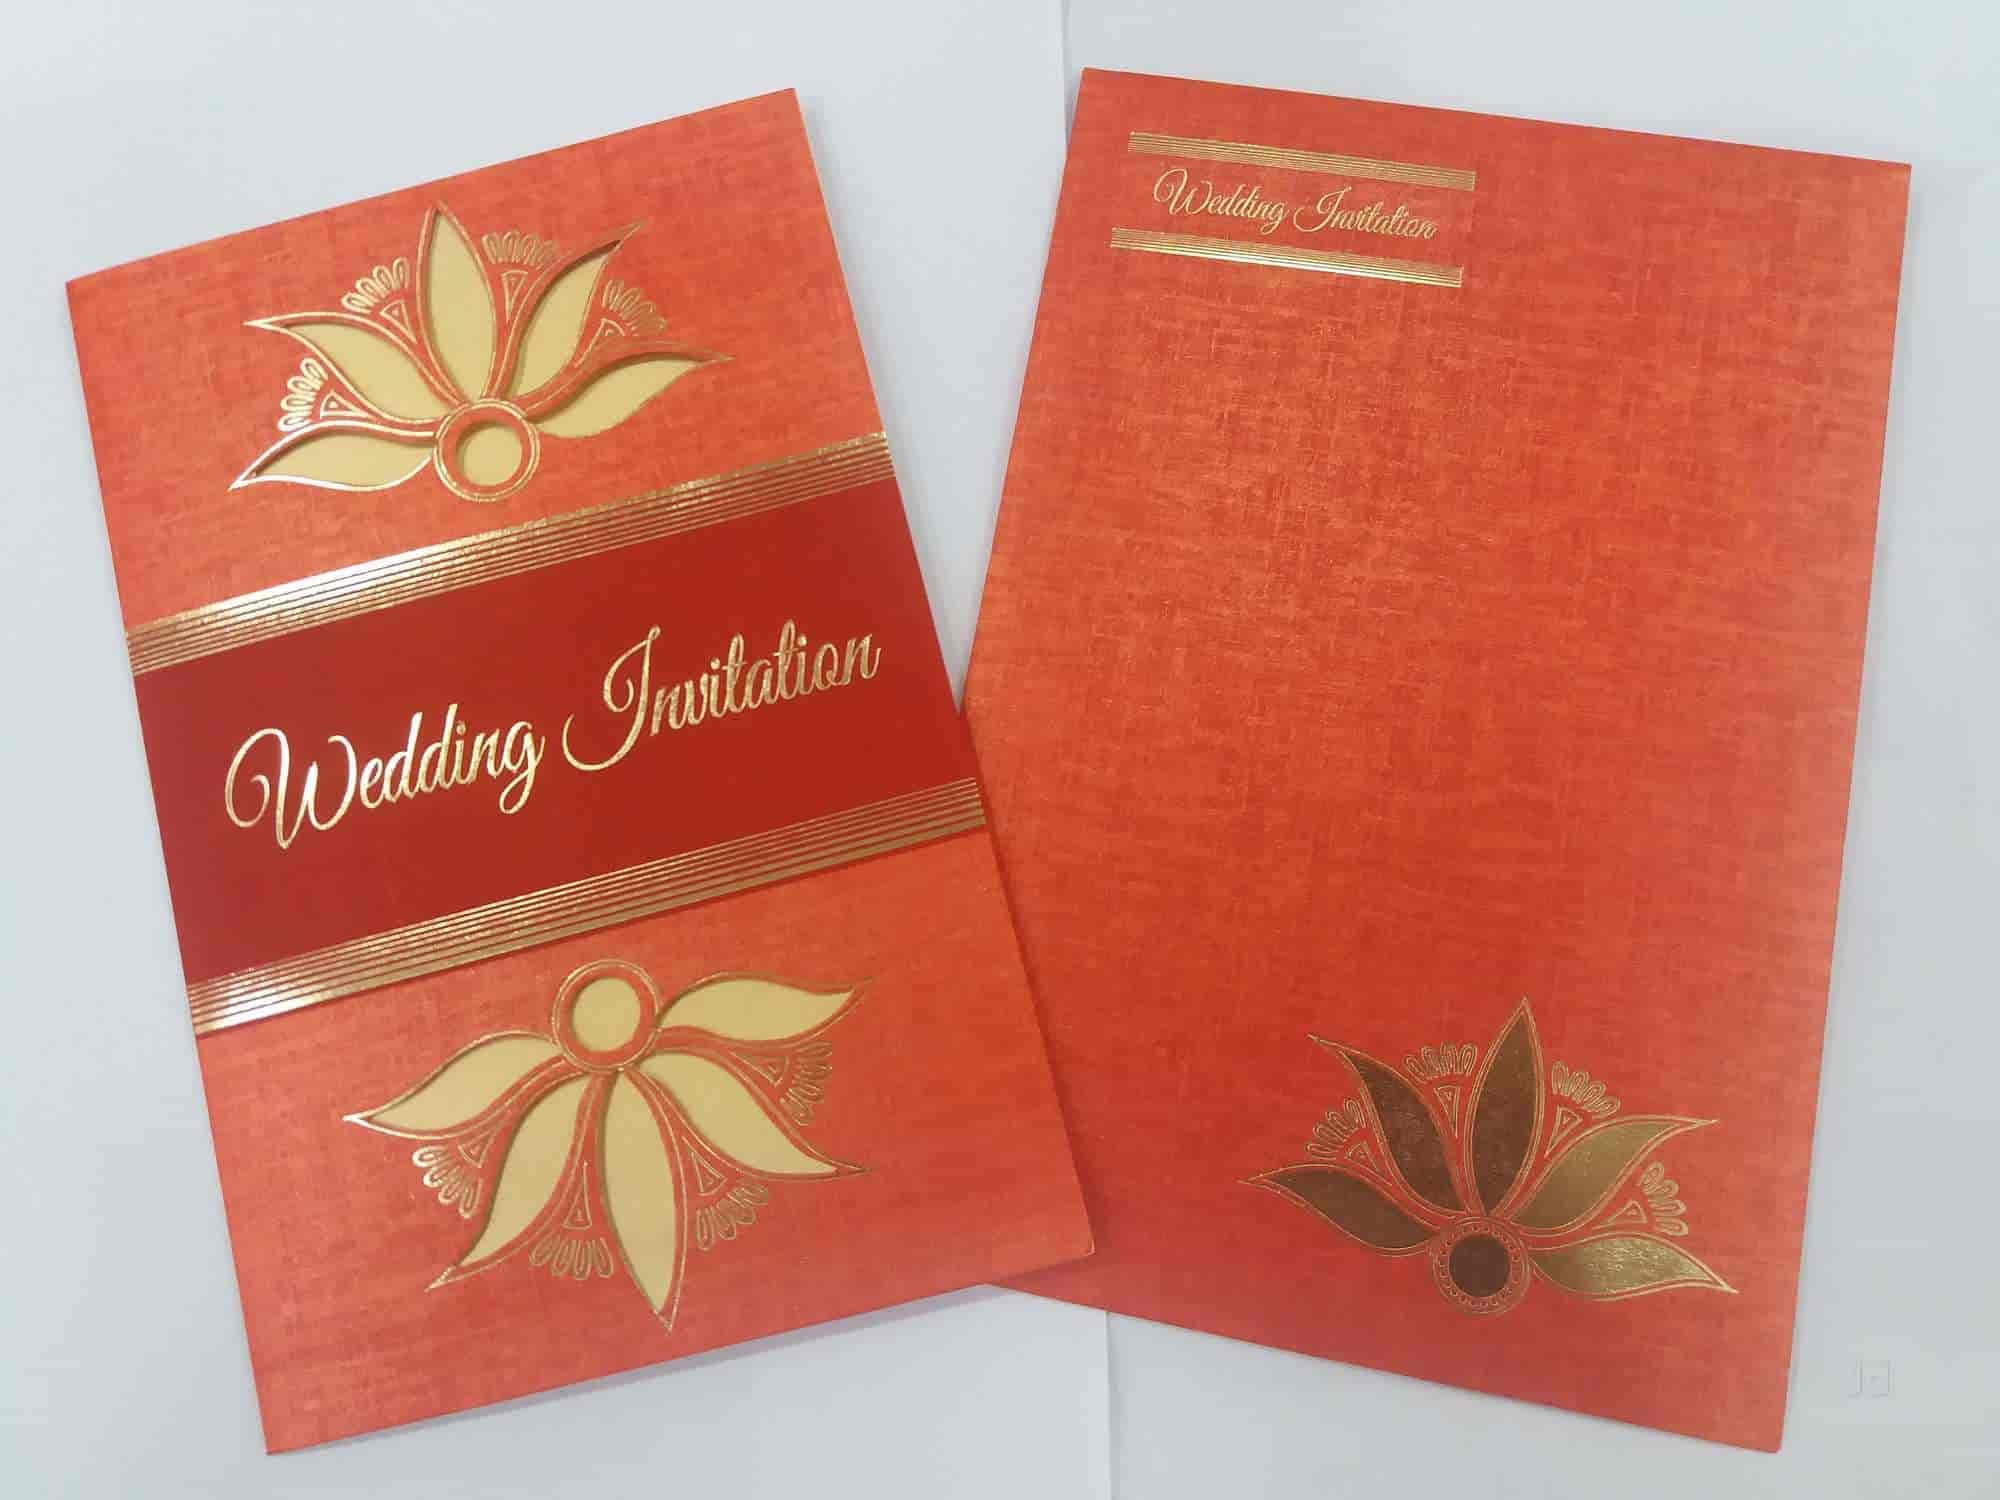 Santhosh Cards - Wedding Card Dealers in Chidambaram - Justdial